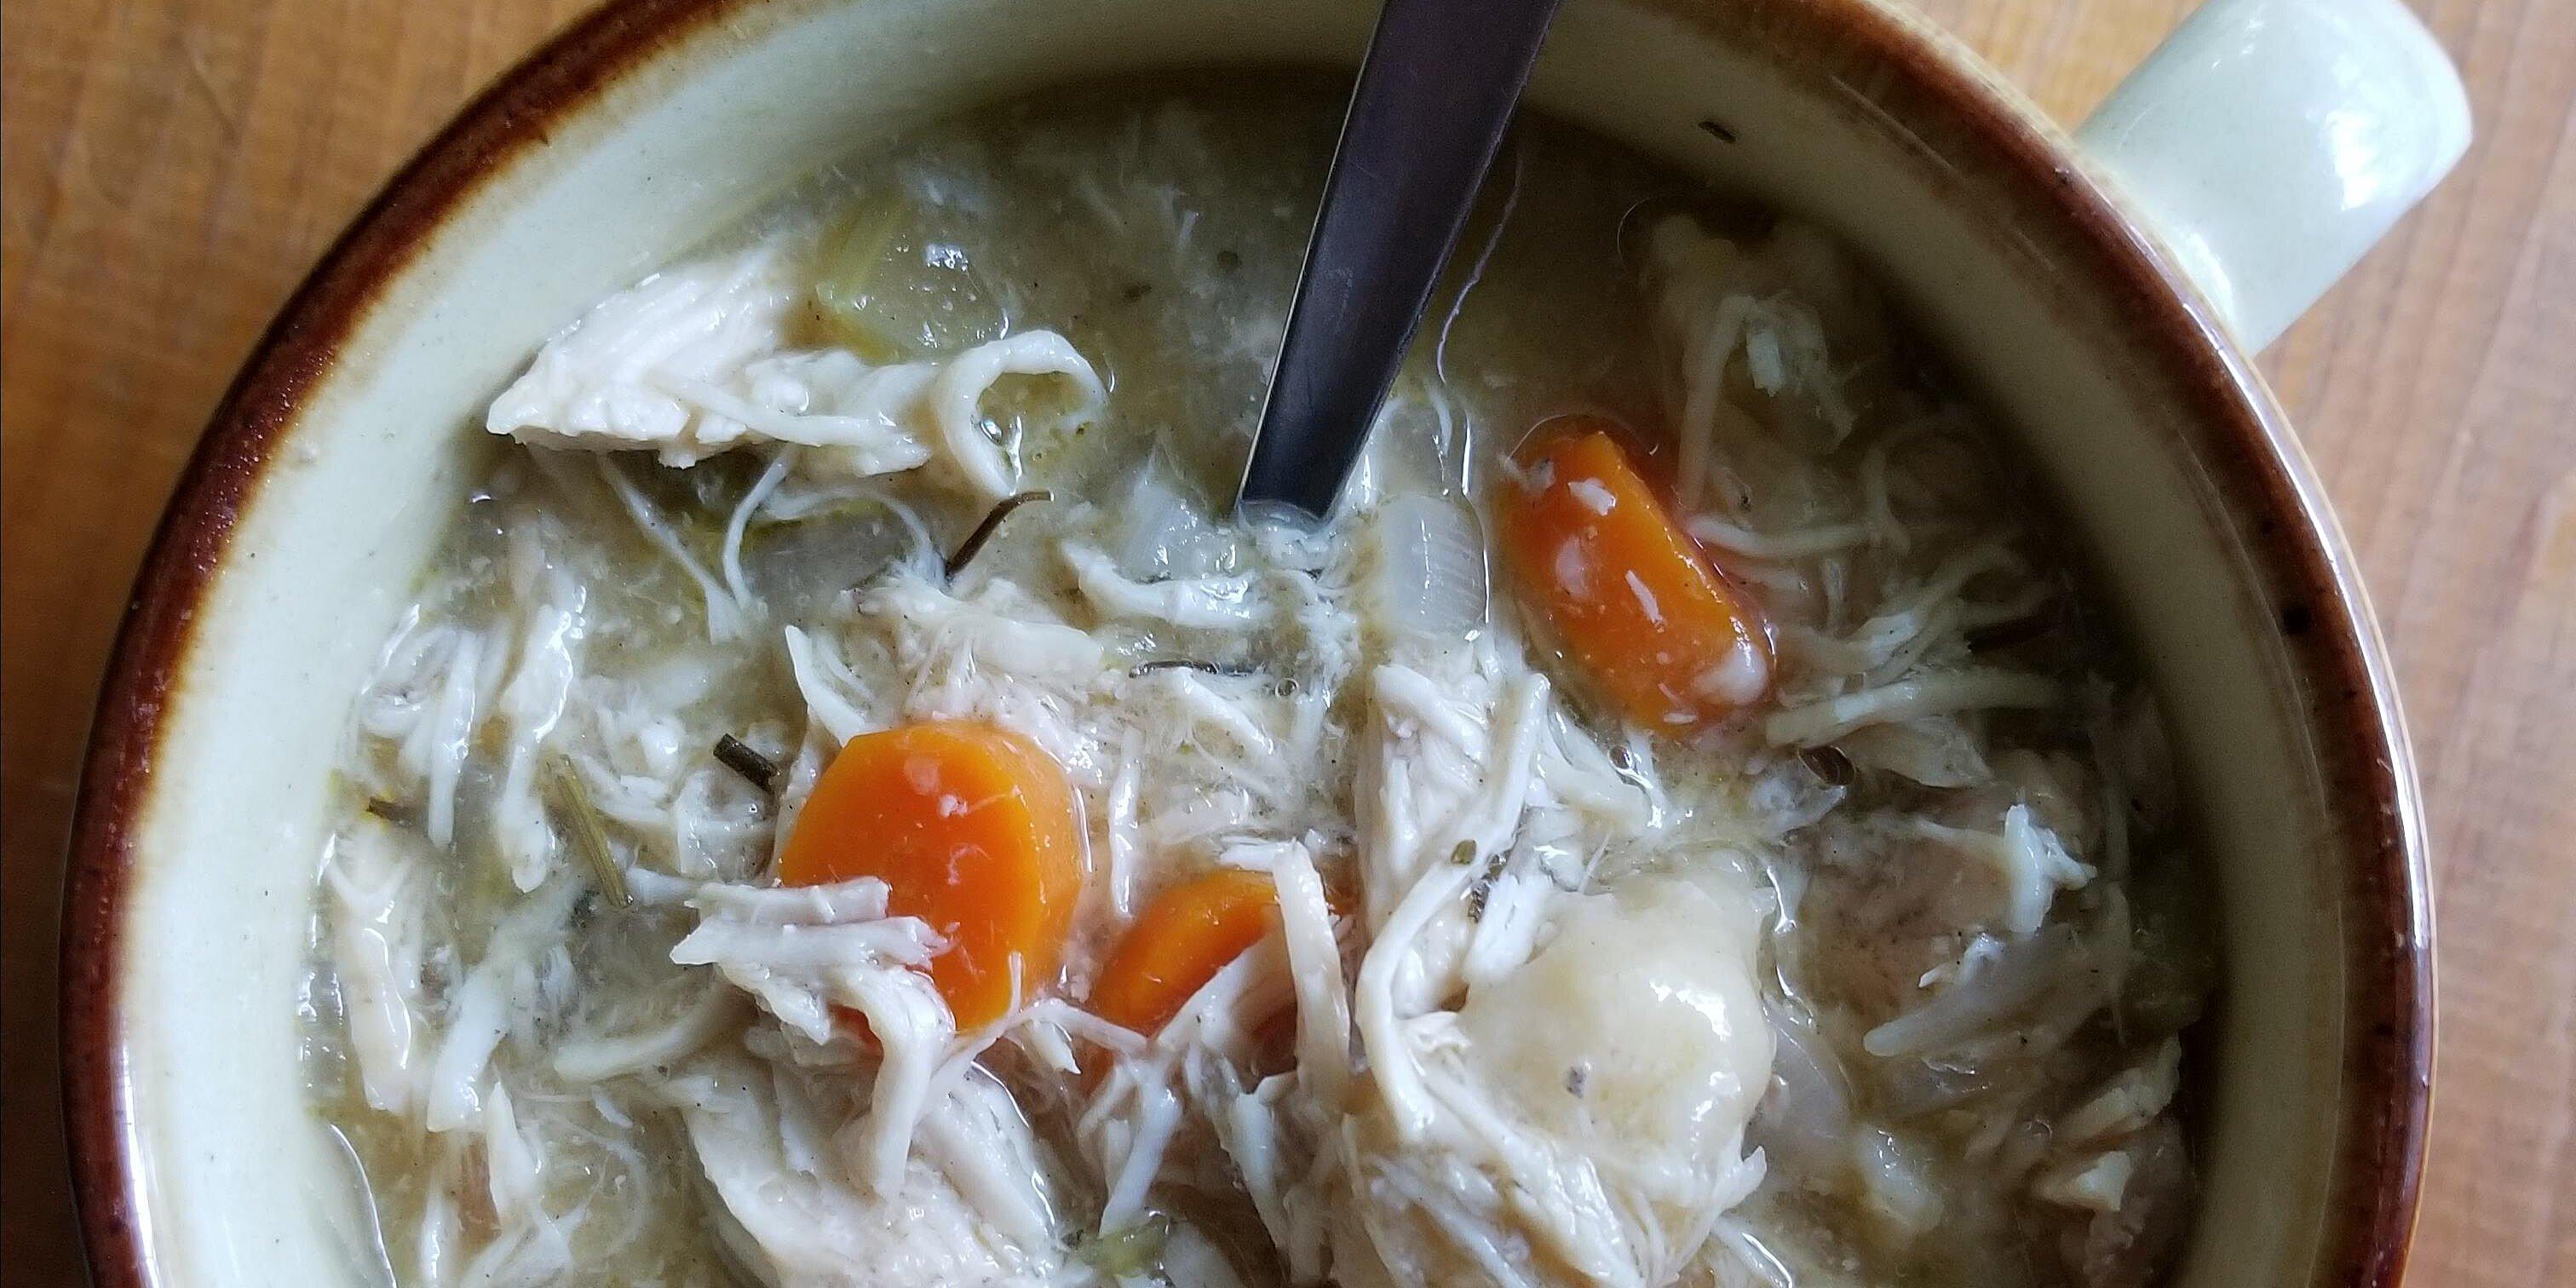 easy slow cooker chicken and dumplings recipe